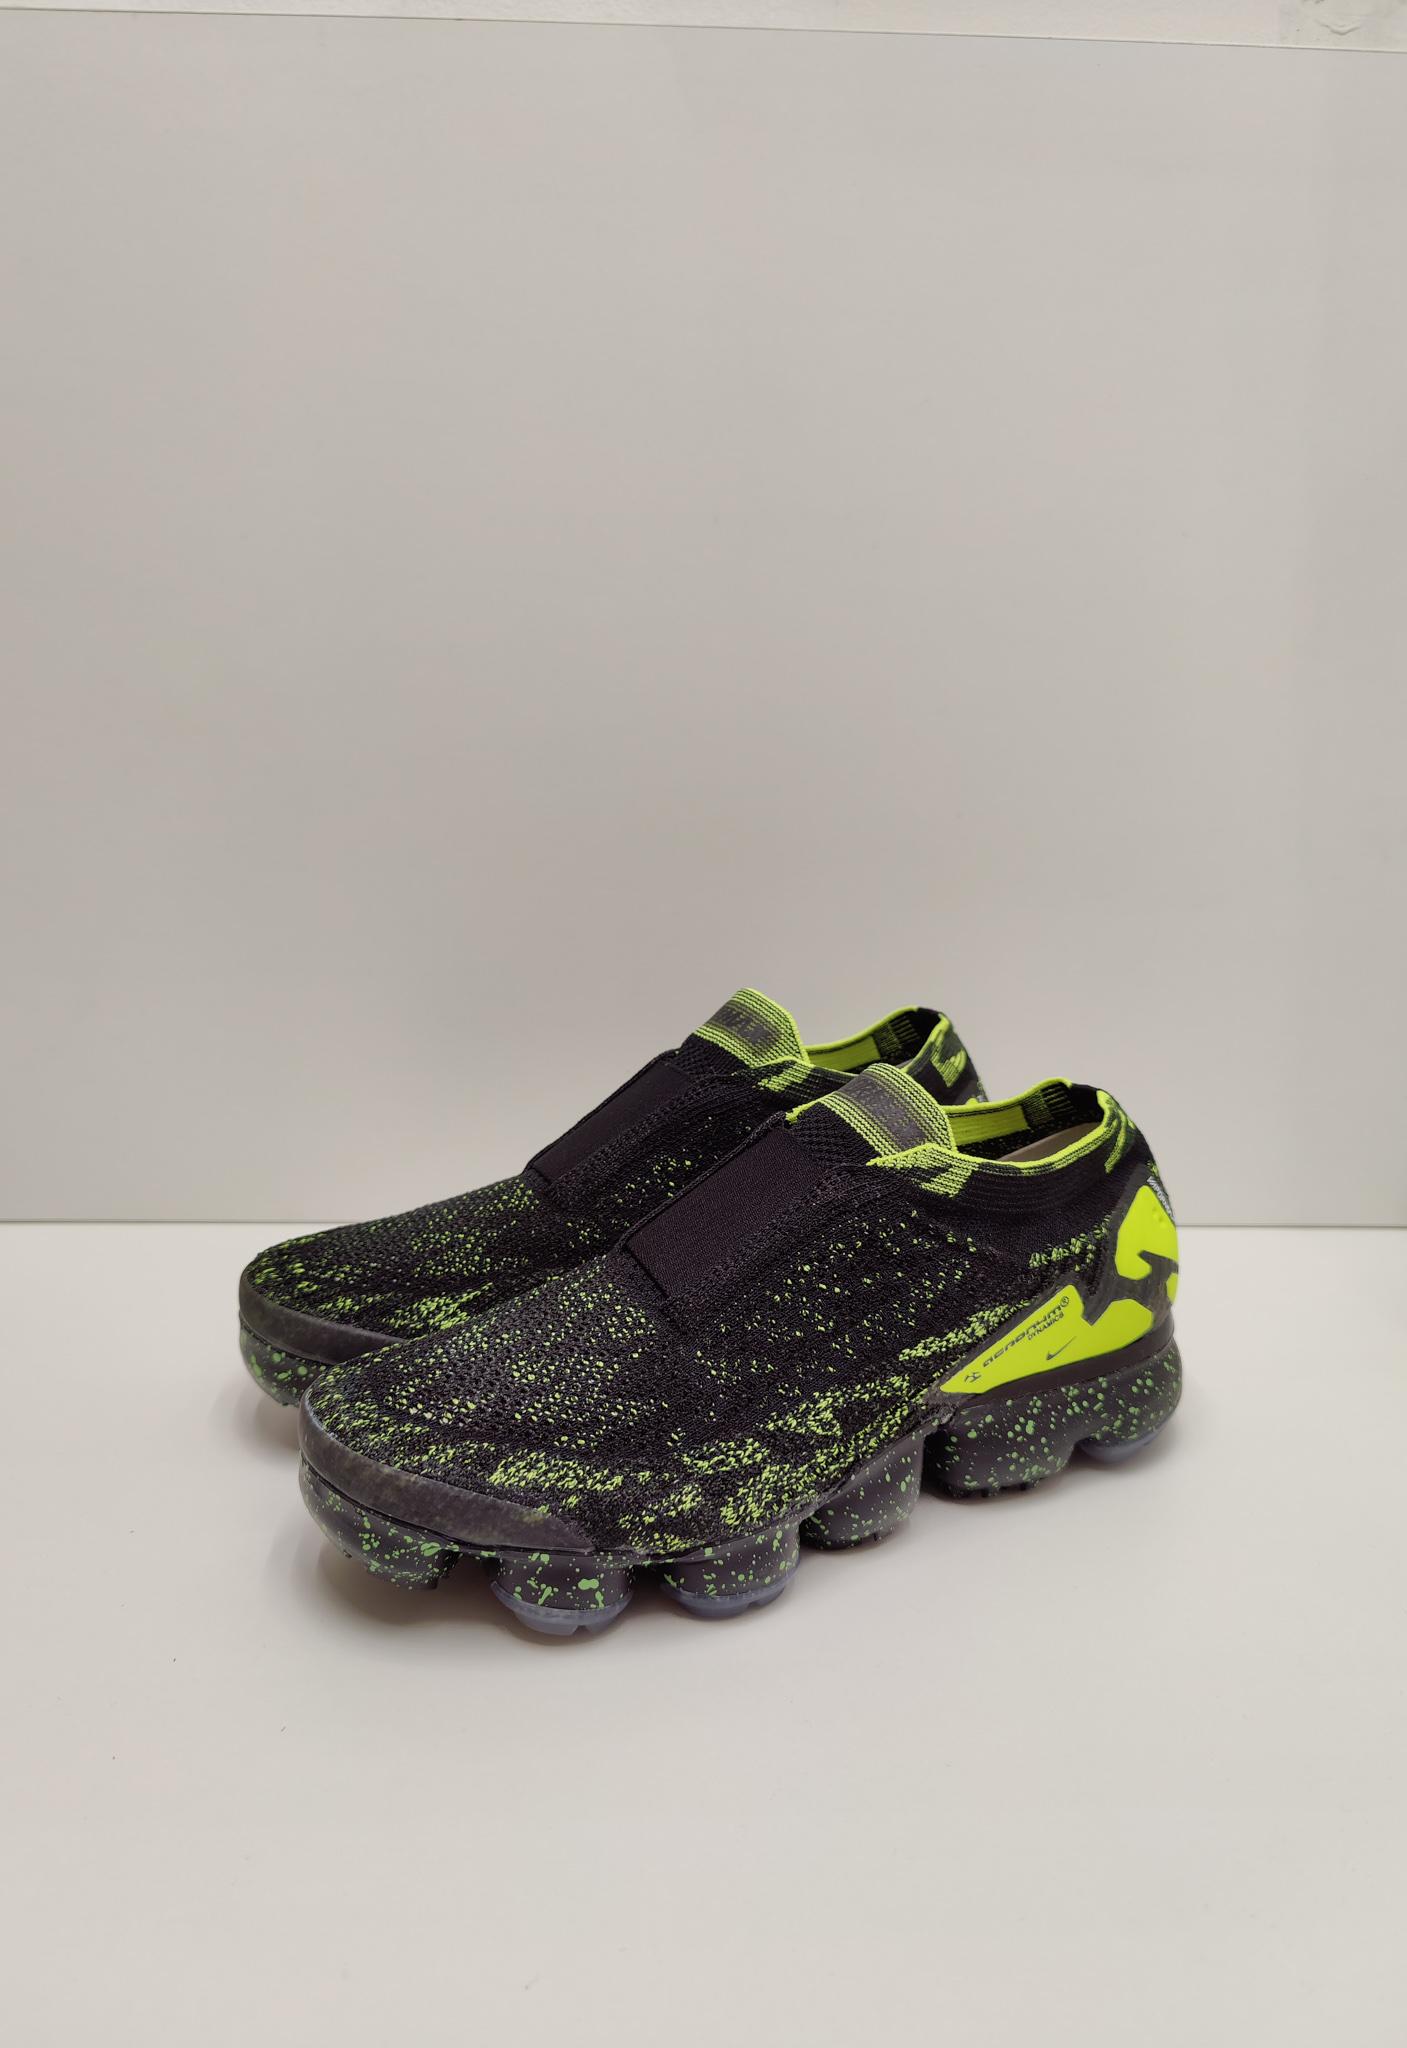 Nike Air VaporMax Moc 2 Acronym Black